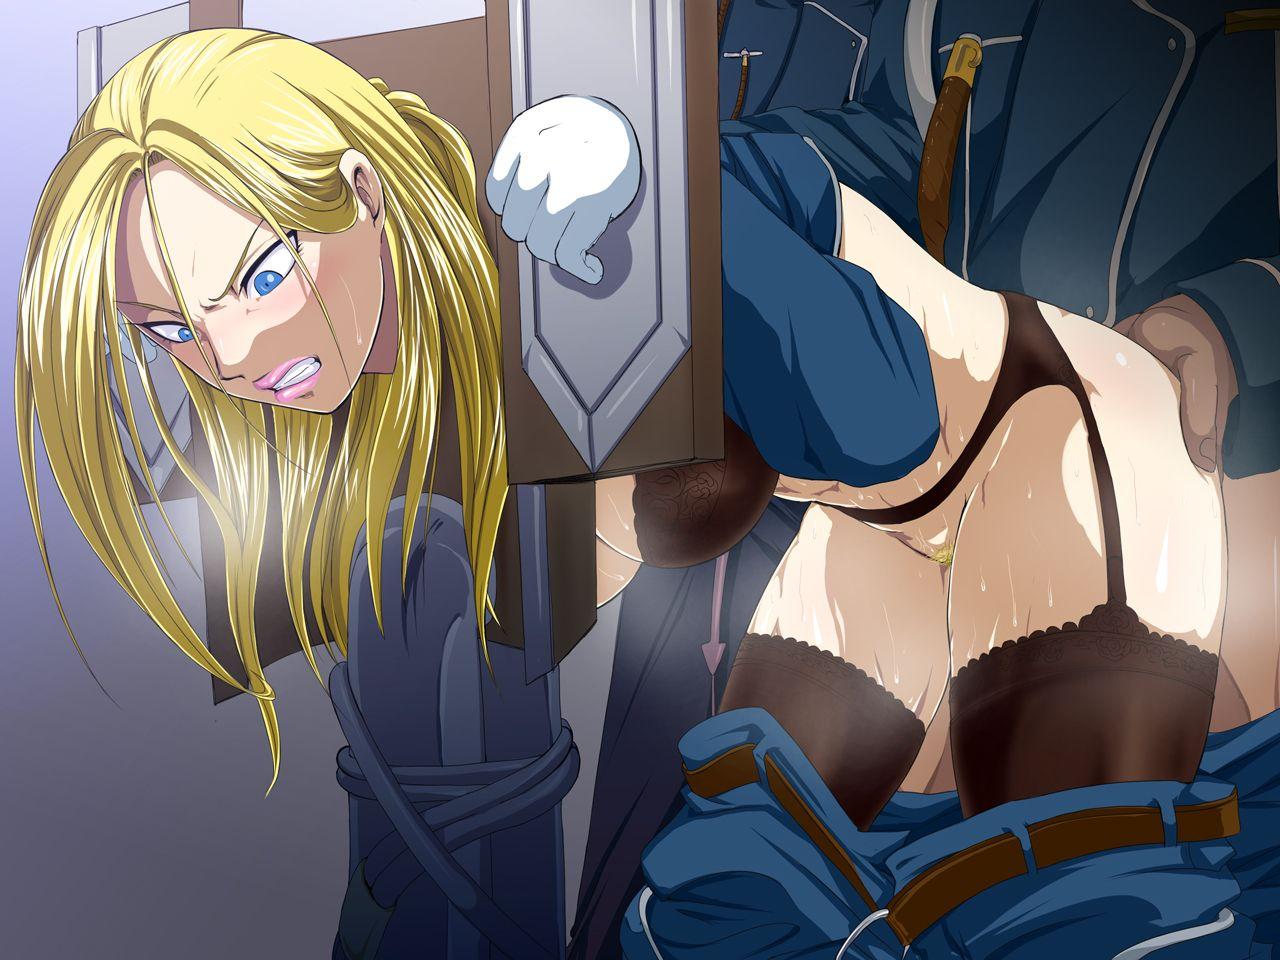 mira armstrong olivier Ifreeta world of final fantasy